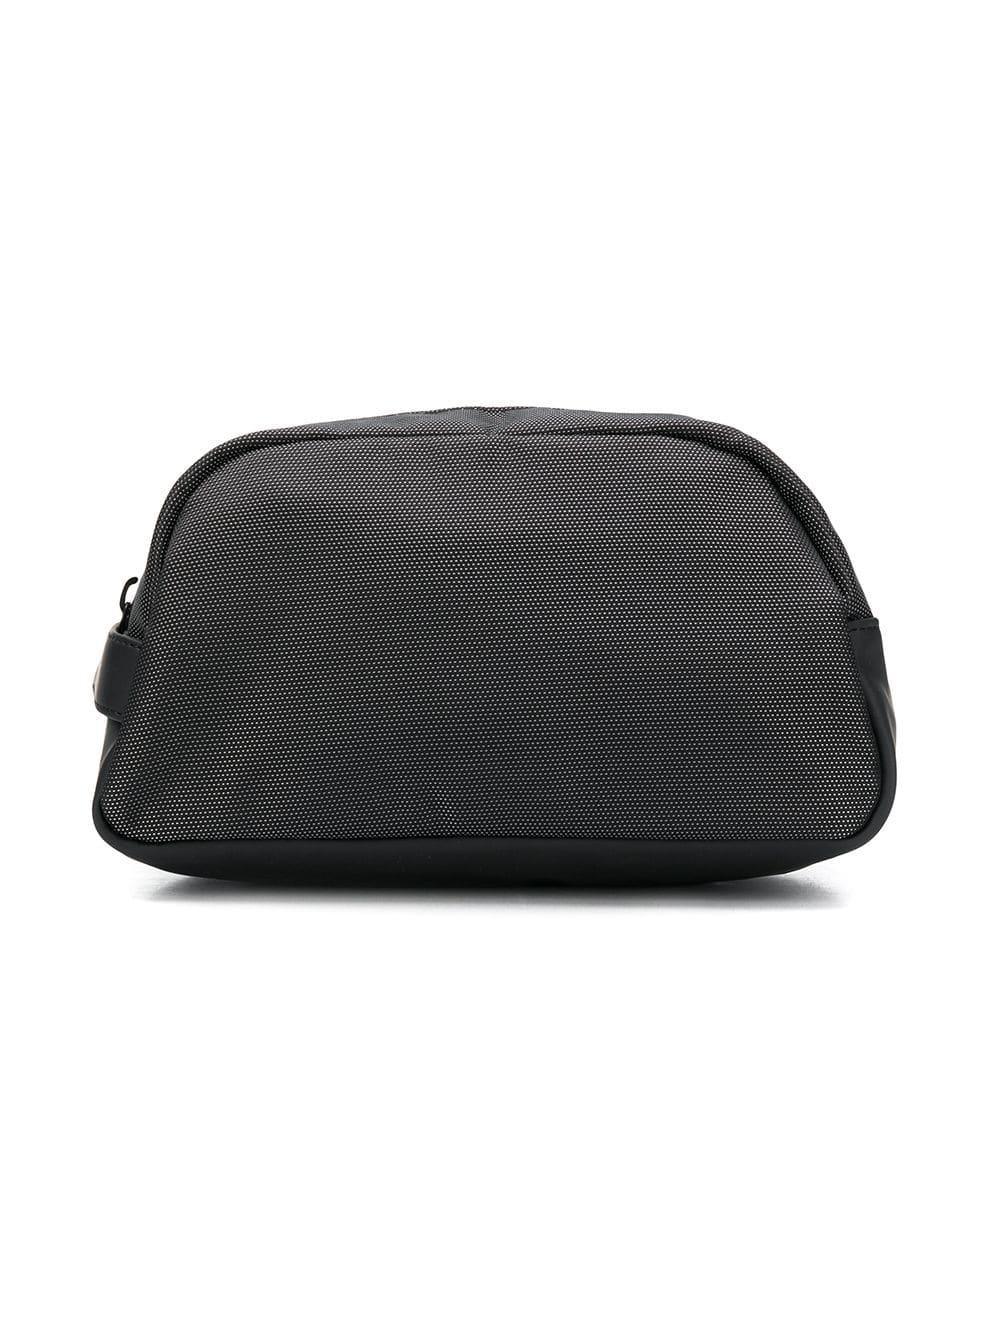 26ea90b4d34 Lyst - Hackett Aston Martin Racing Wash Bag in Black for Men